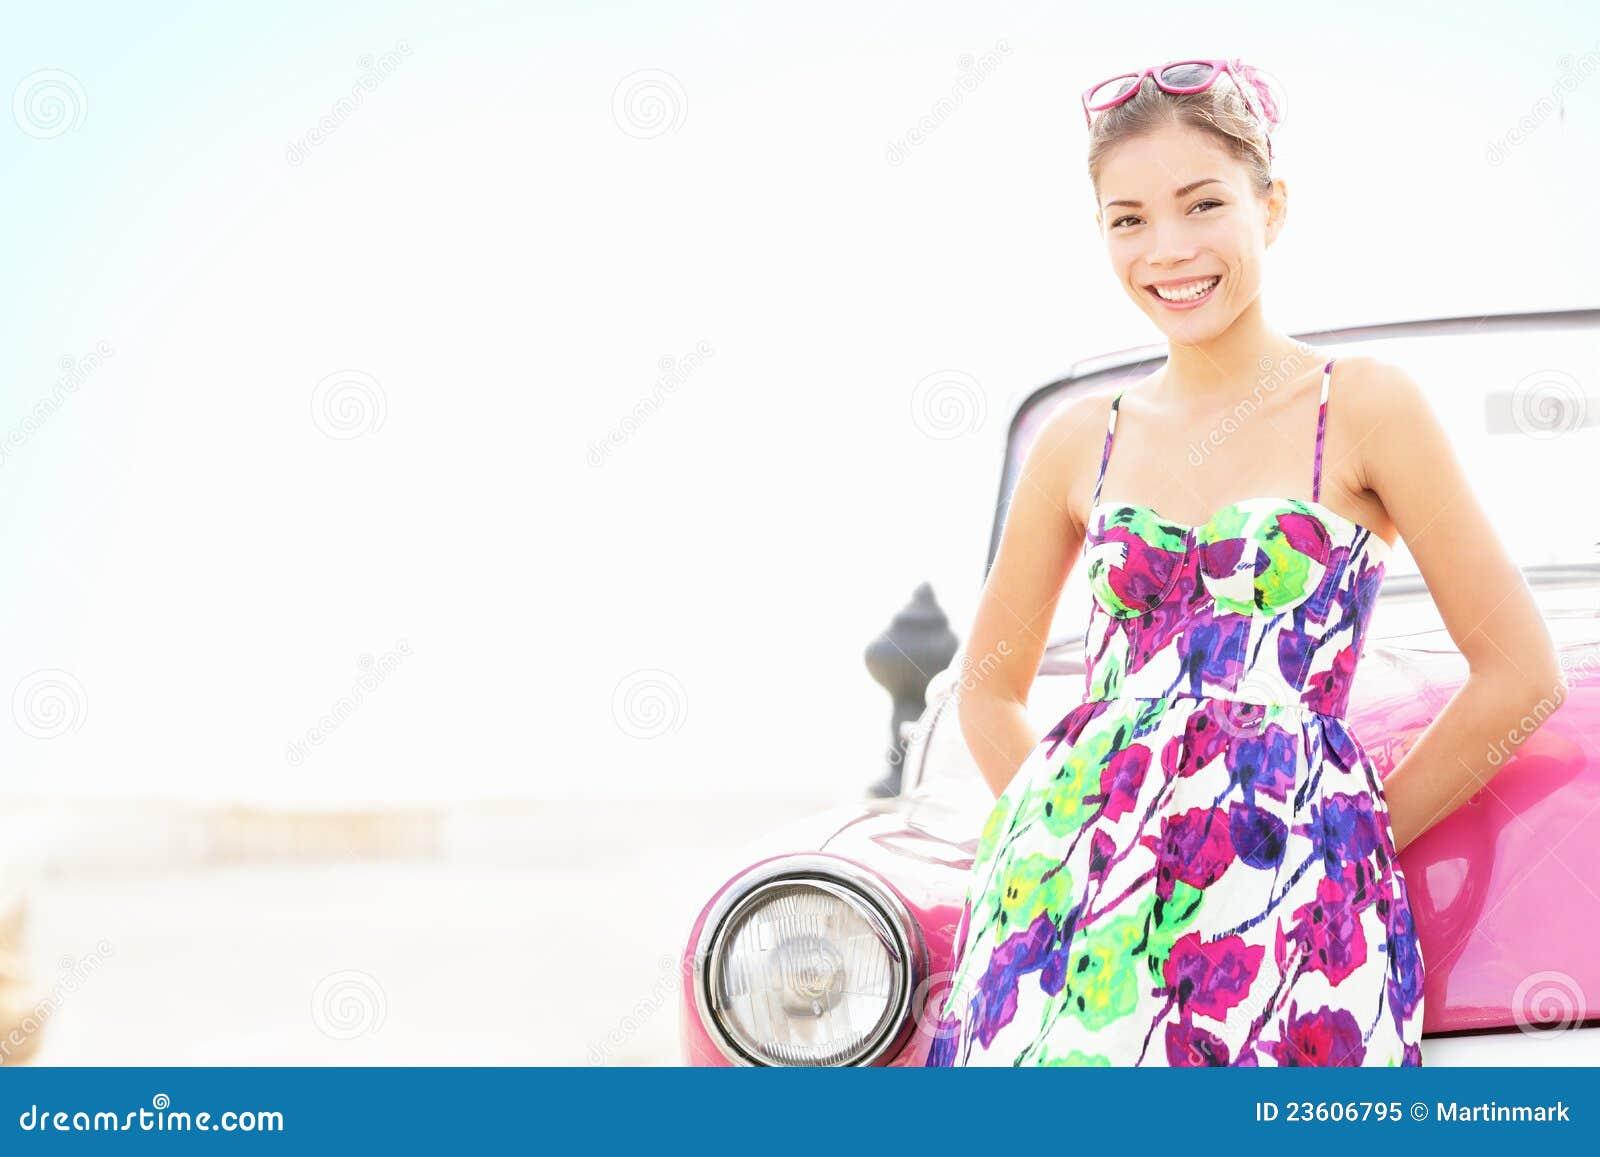 Car woman smiling happy